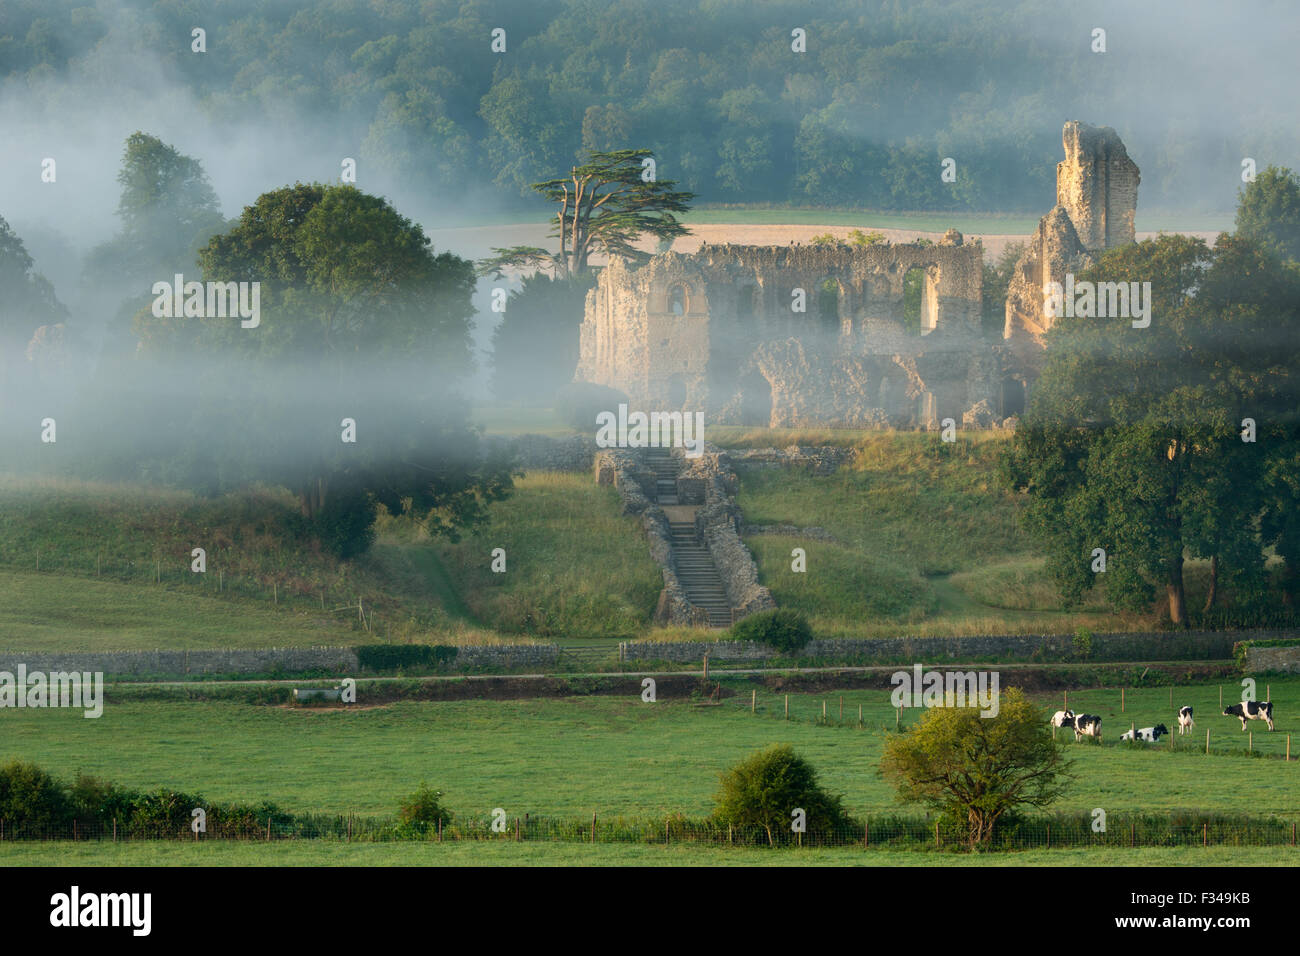 Vieux château de Sherborne, Sherborne, Dorset, England, UK Photo Stock